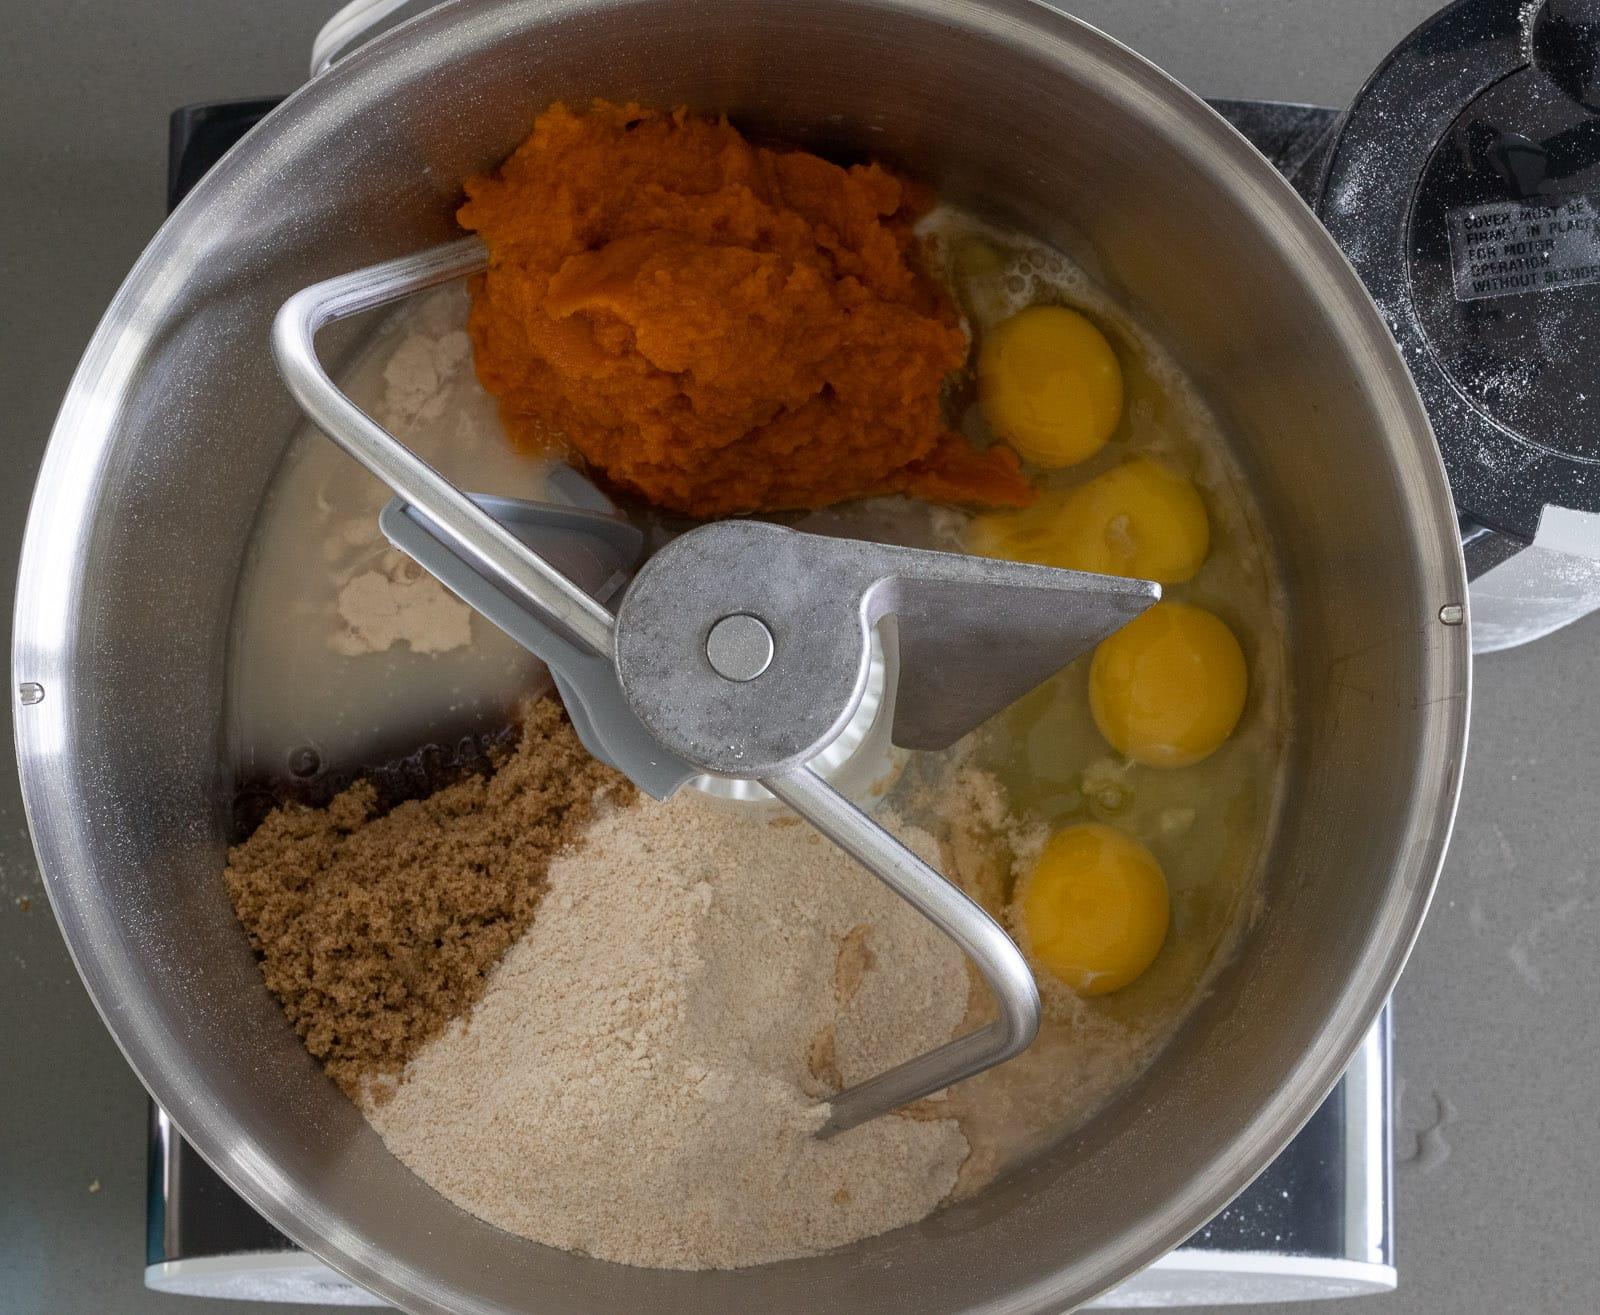 Ingredients for pumpkin brioche dough in a Bosch mixer.